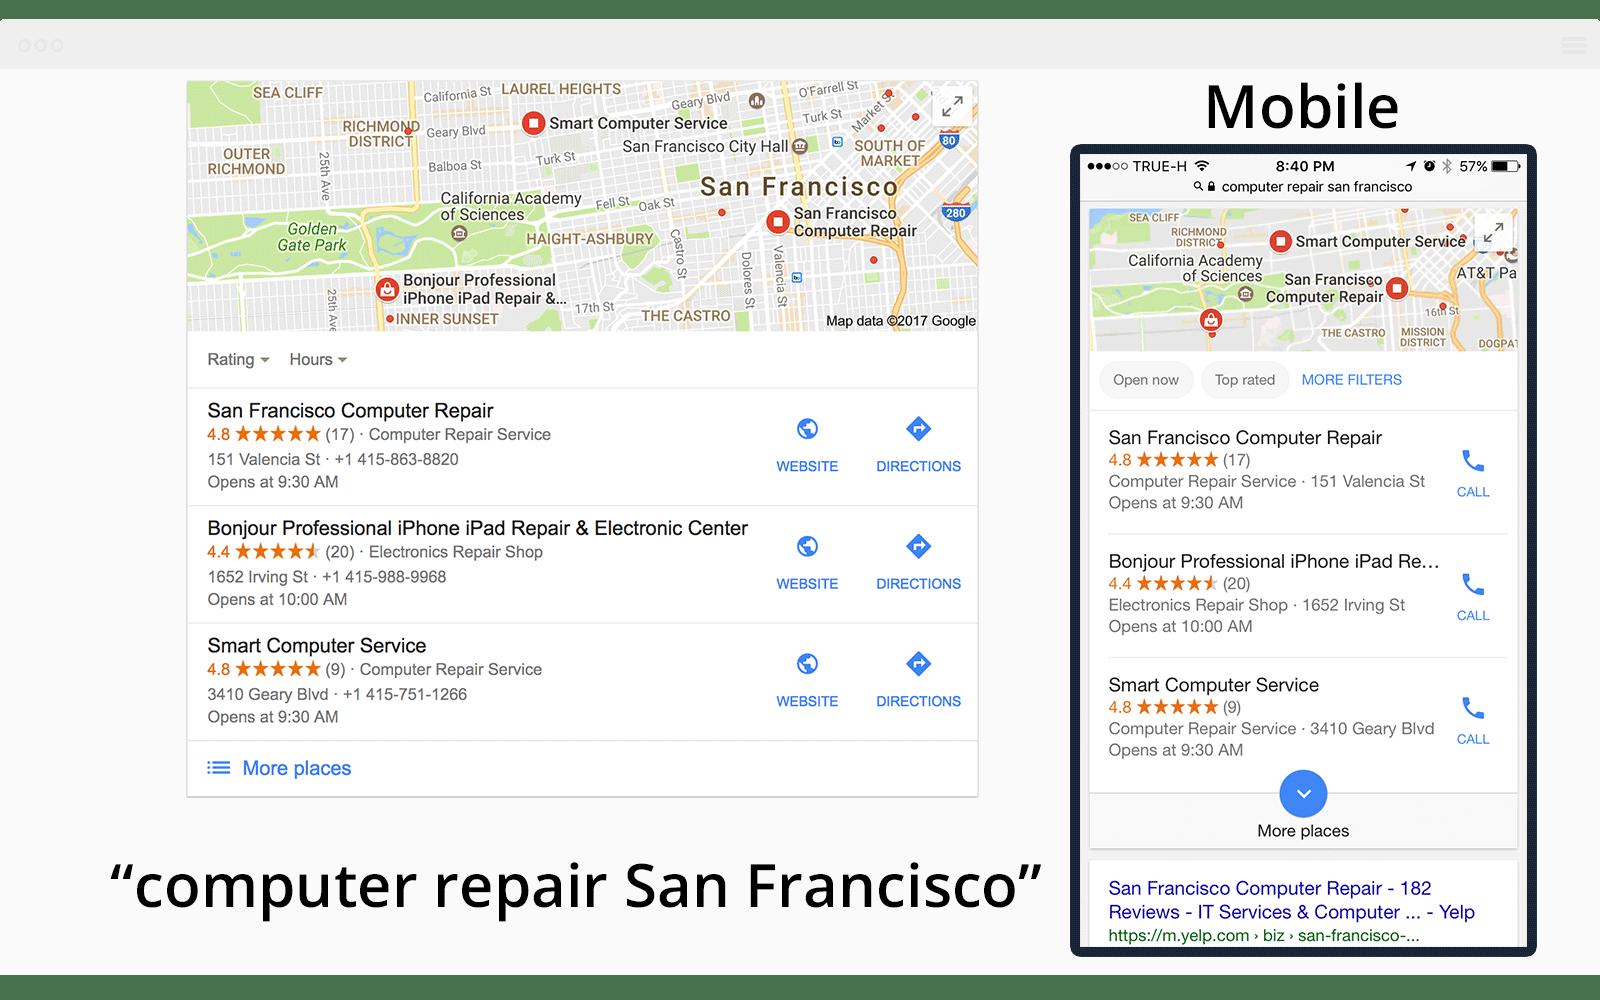 San Francisco Computer Repair Google SERP